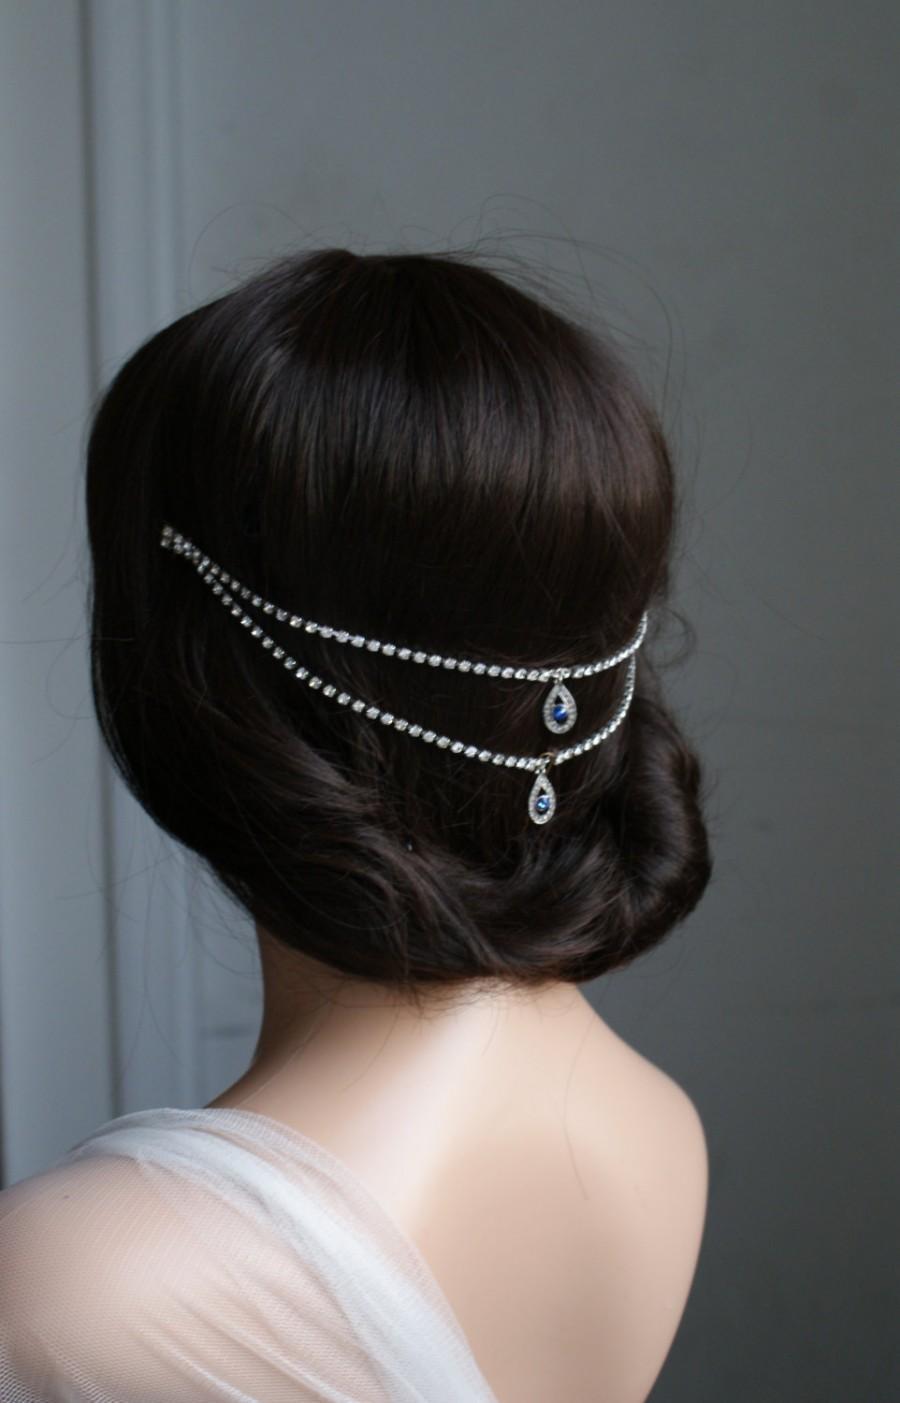 Wedding - Wedding Headpiece, Sapphire Blue crystal, Bohemian Headchain Accessory, Something Blue hair accessory, back headpiece bun accessory